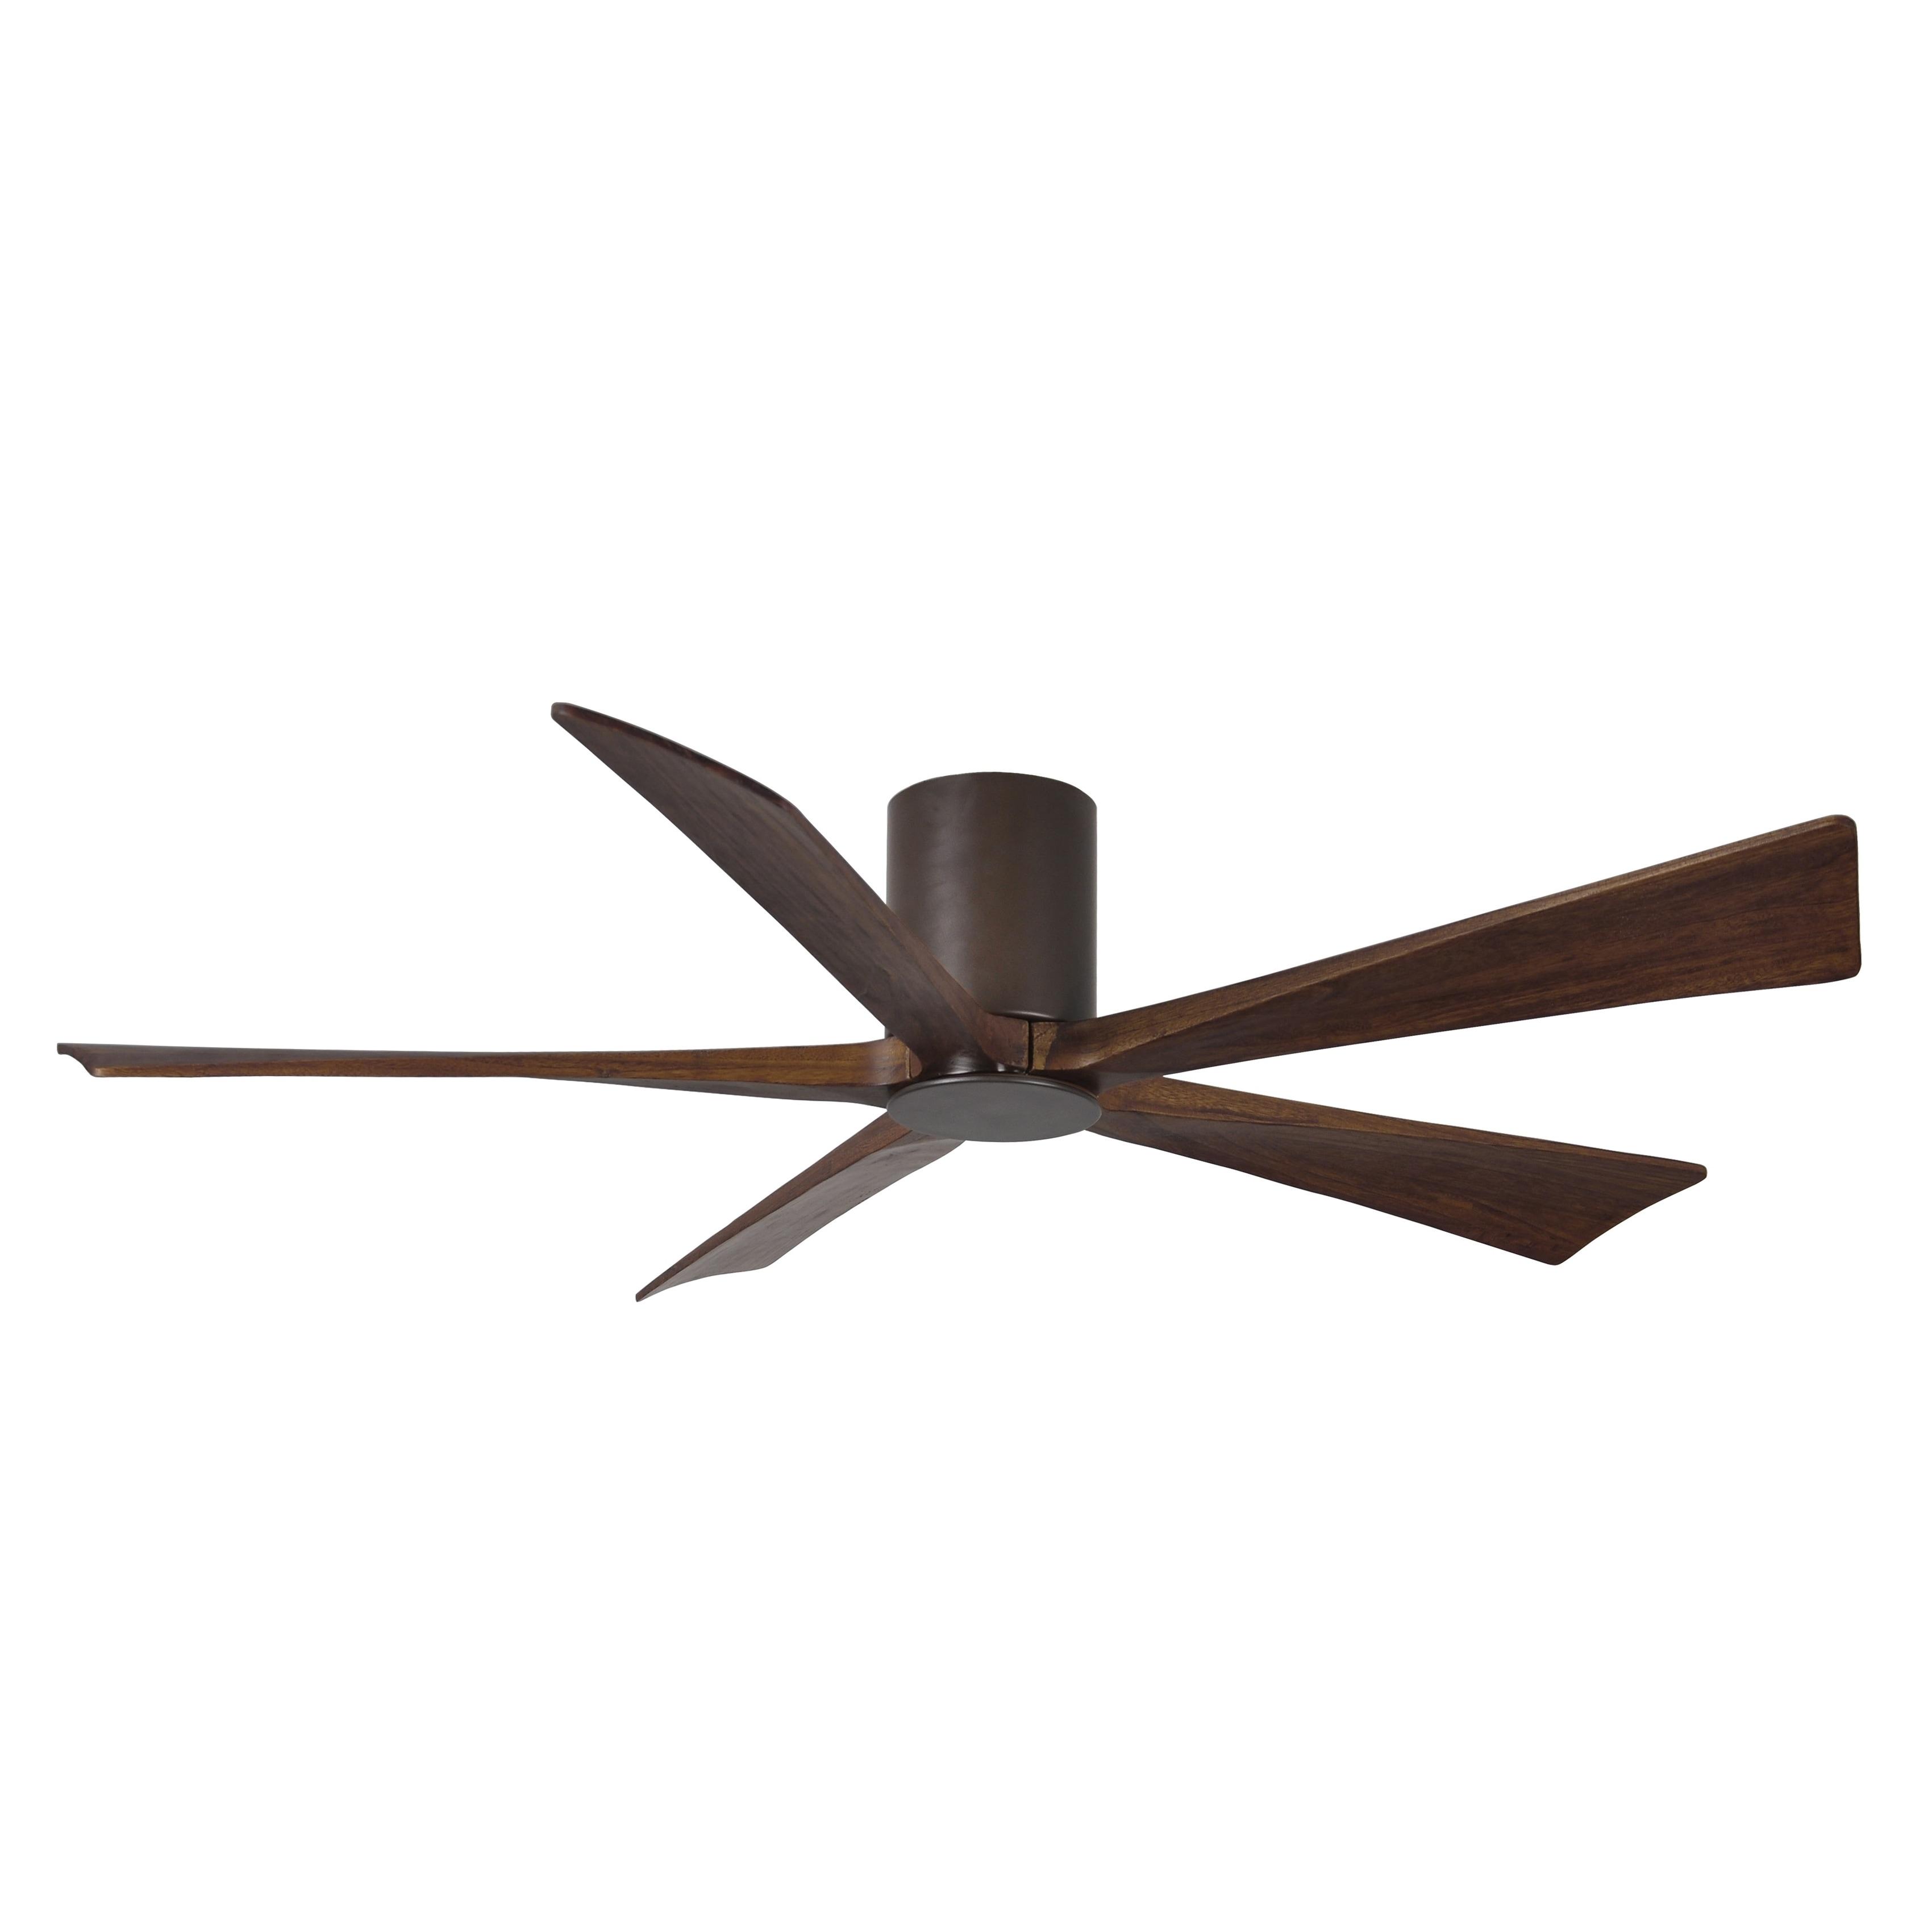 Shop Matthews Fan pany Irene 5 blade 60 inch Textured Bronze